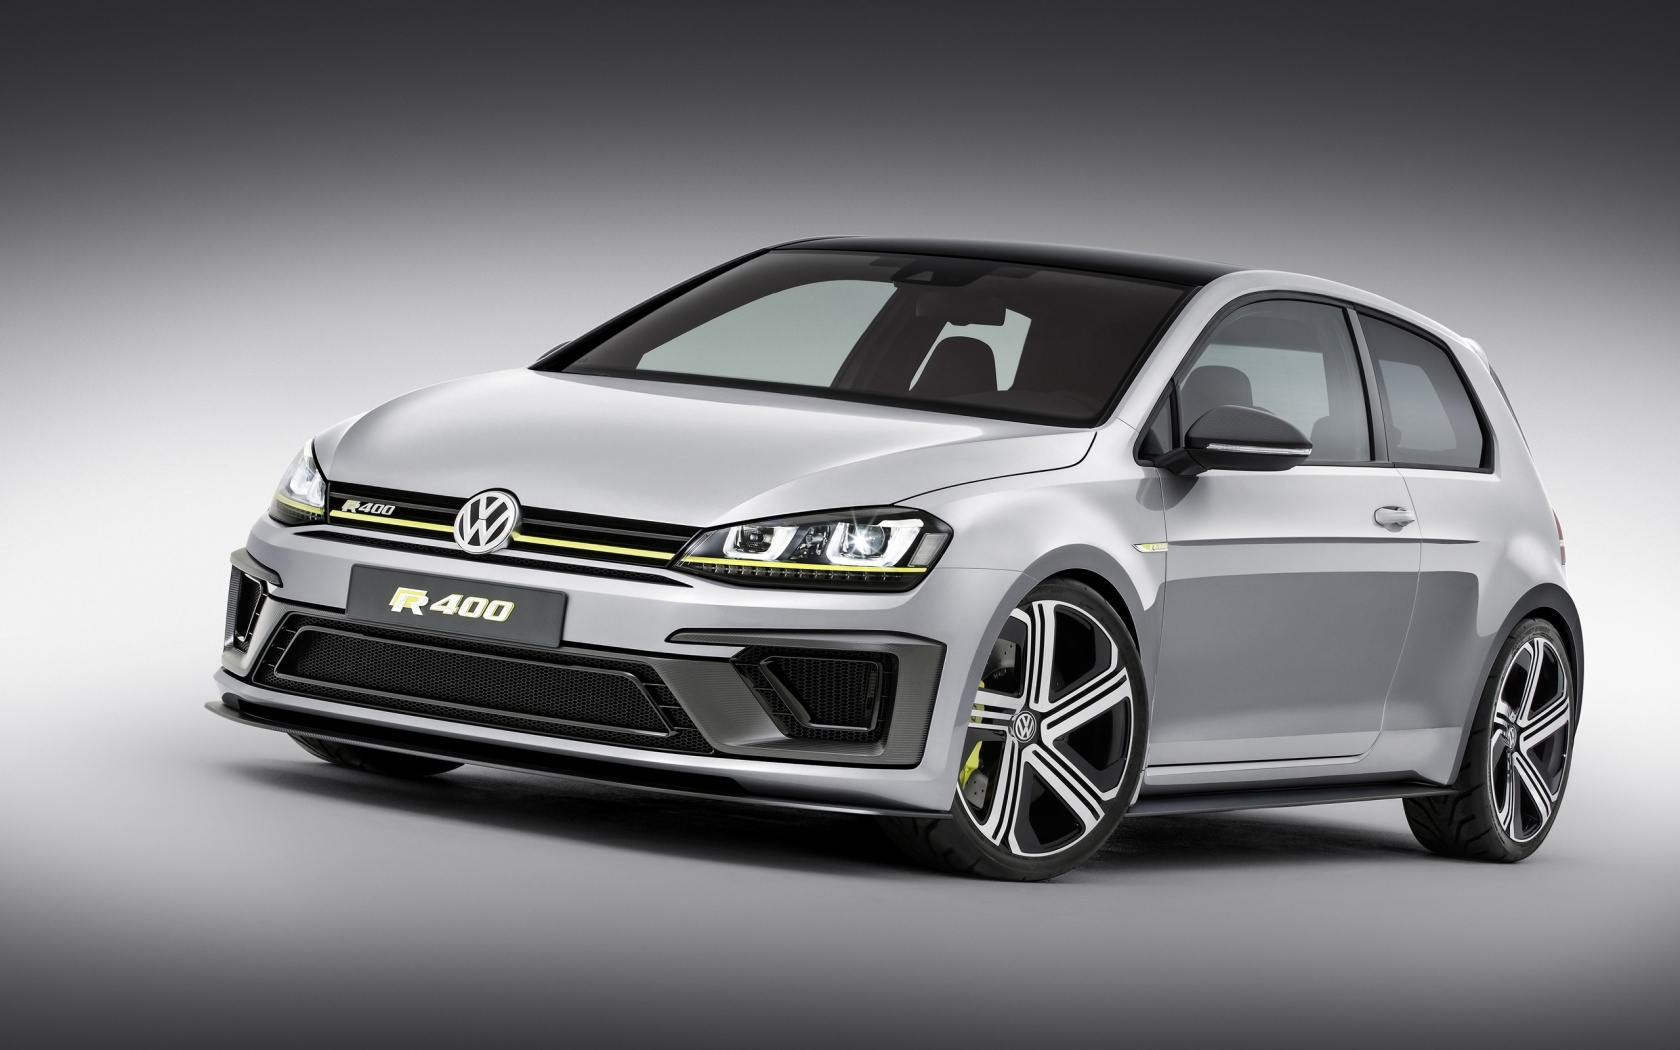 2014 Volkswagen Golf R 400 Wallpaper HD Car Wallpapers 1680x1050